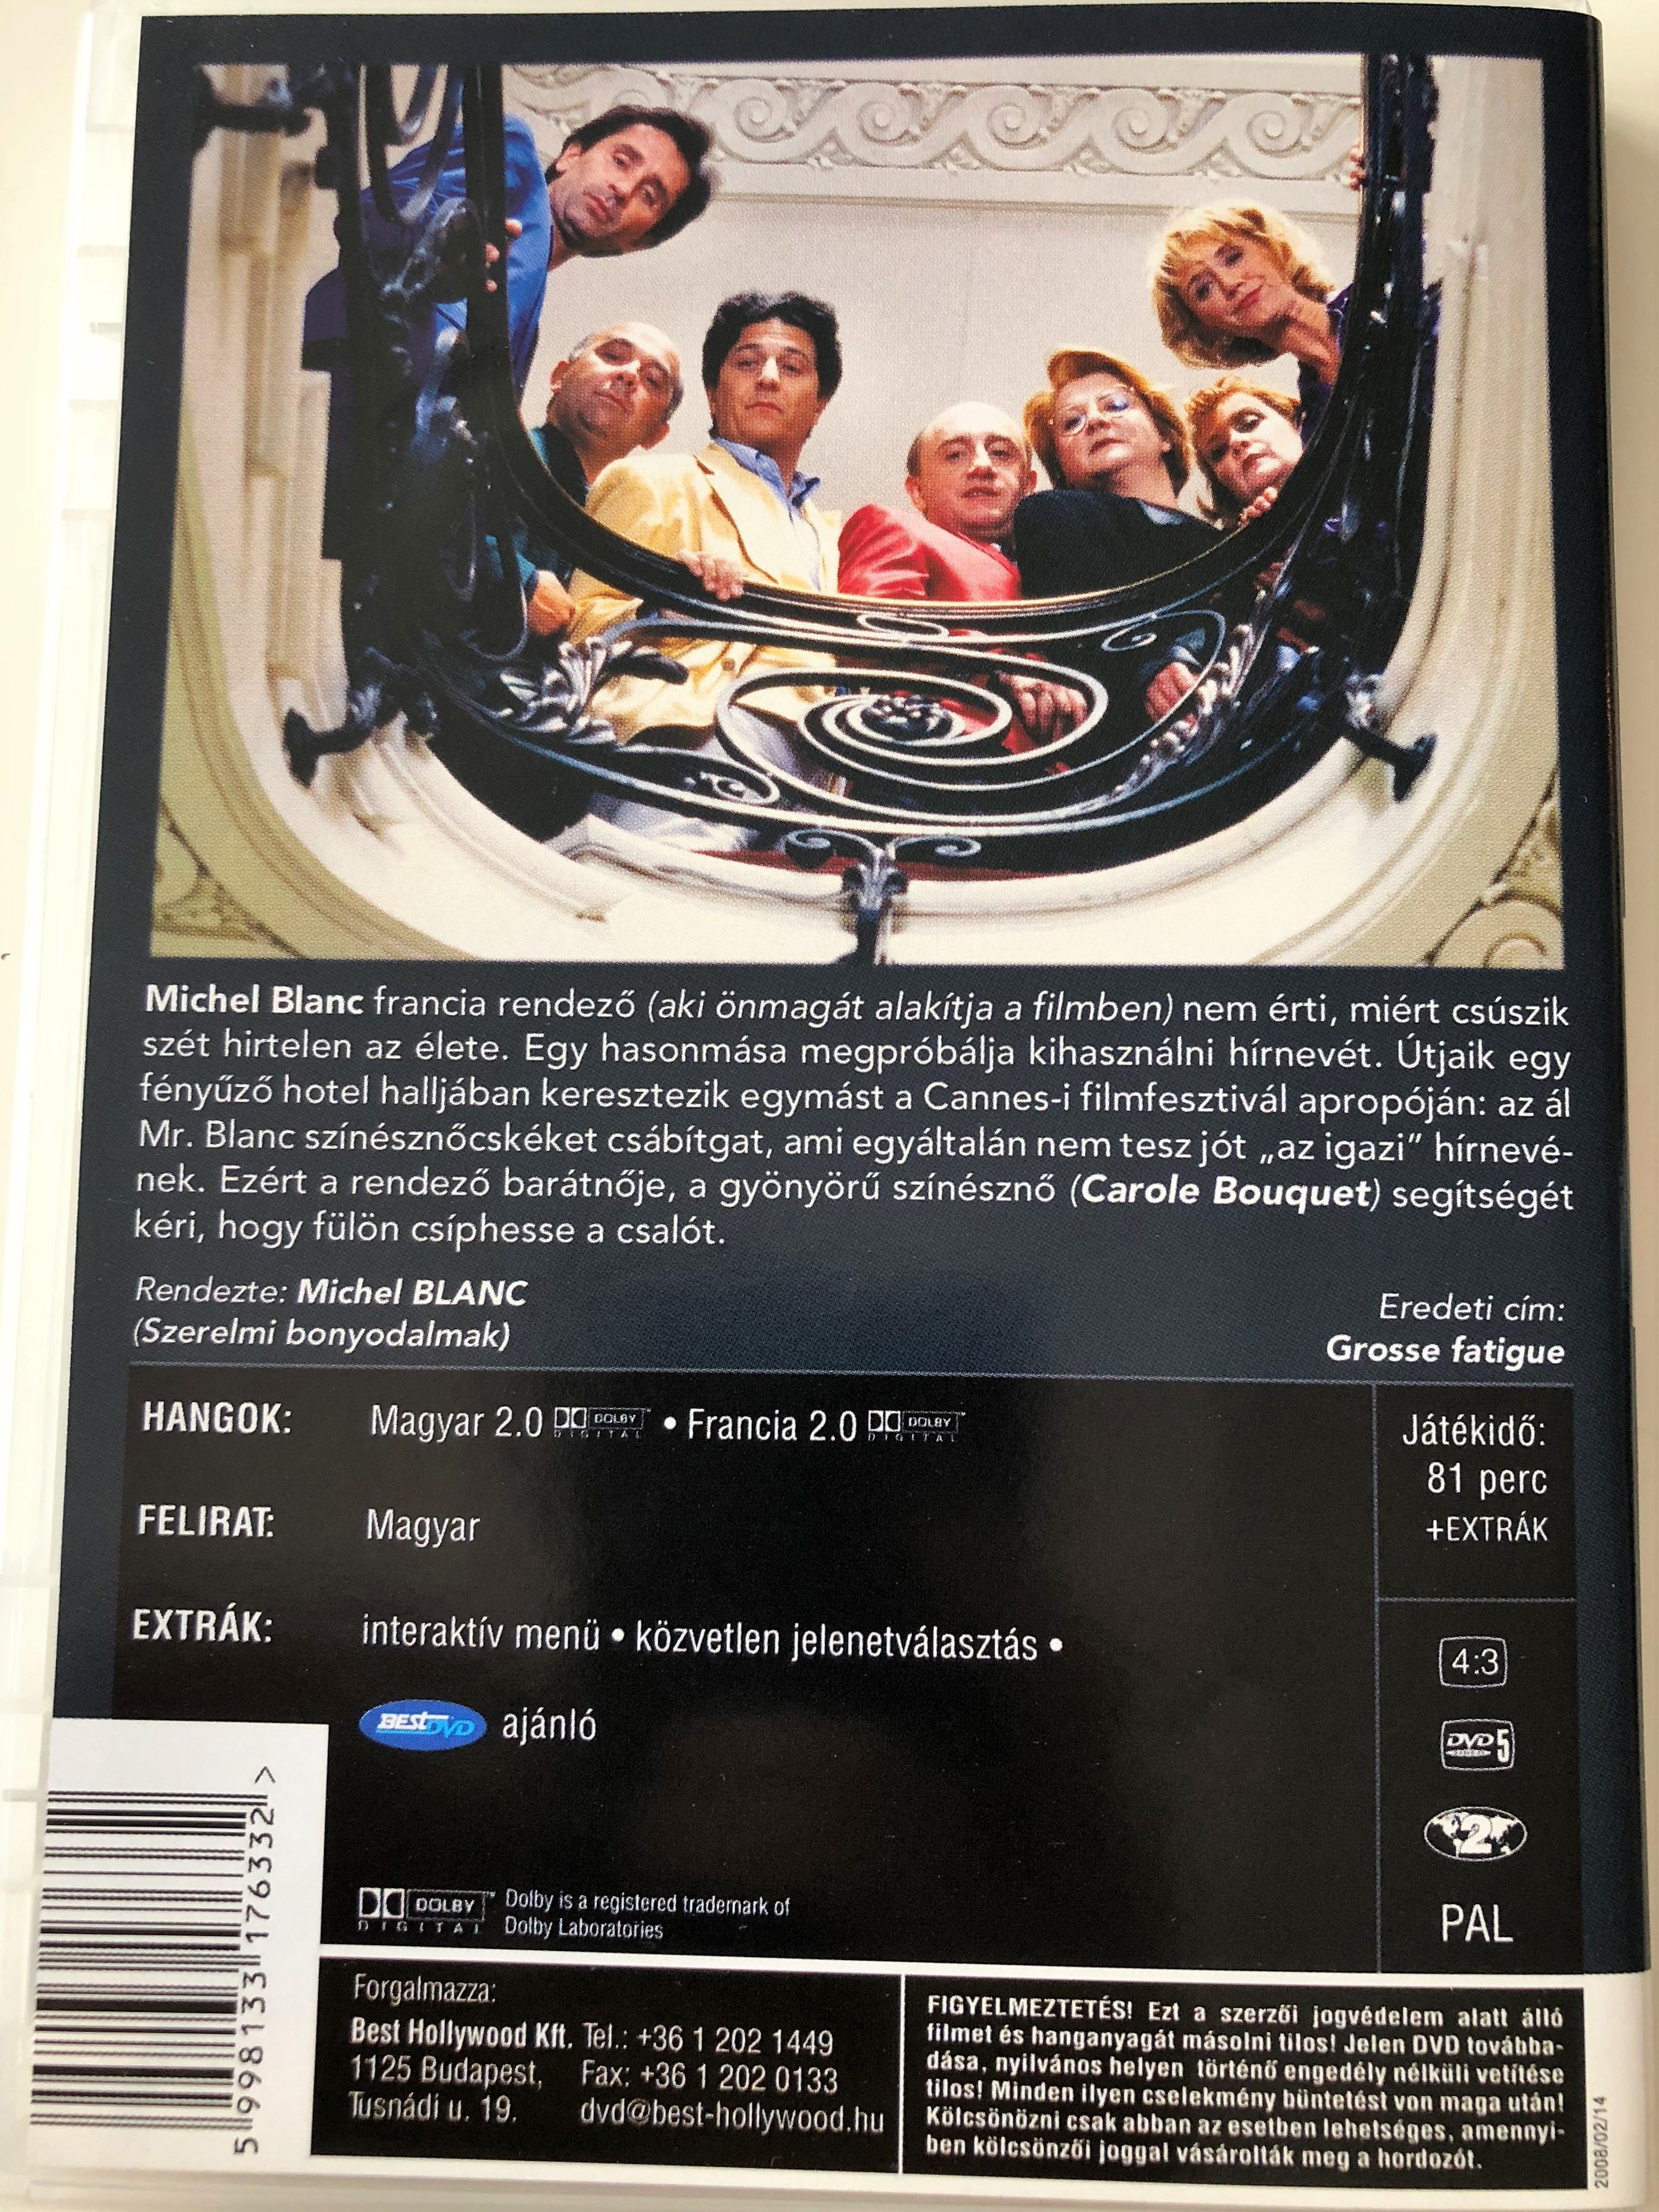 gross-fatigue-dead-tired-dvd-1993-seg-ts-g-csal-directed-by-michel-blanc-starring-michel-blanc-carole-bouquet-2-.jpg